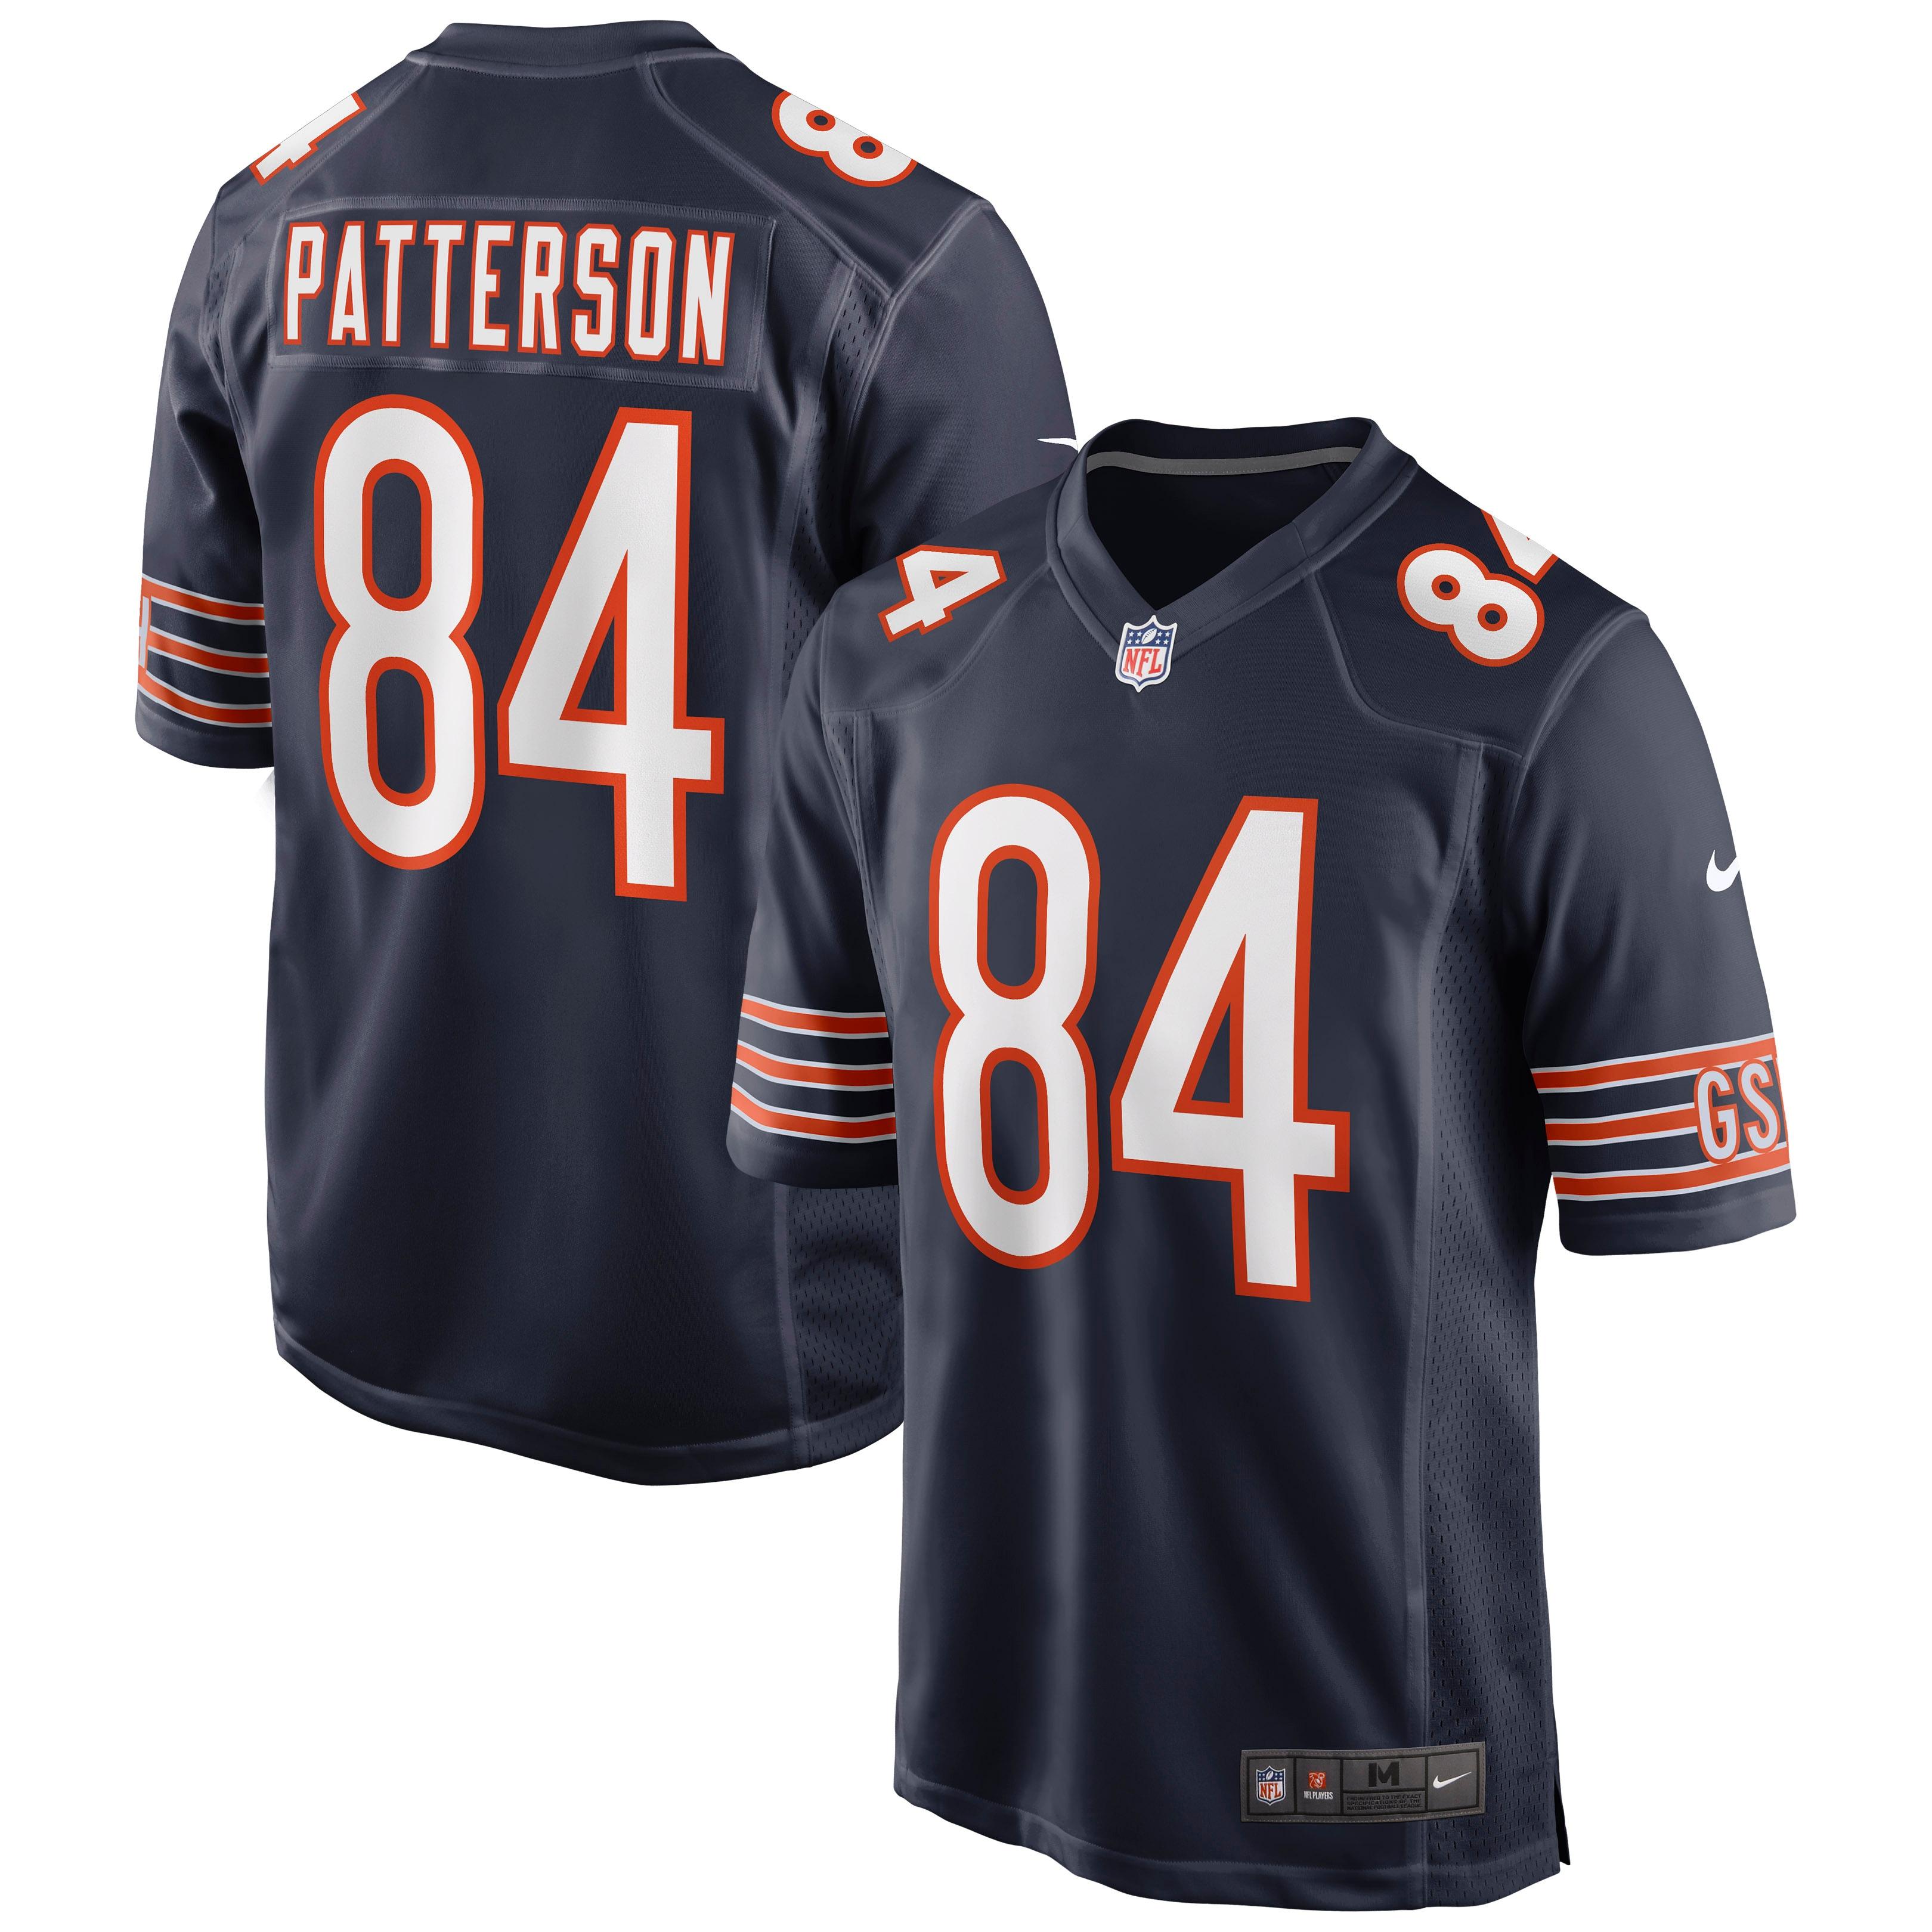 Cordarrelle Patterson Chicago Bears Nike Game Jersey - Navy - Walmart.com